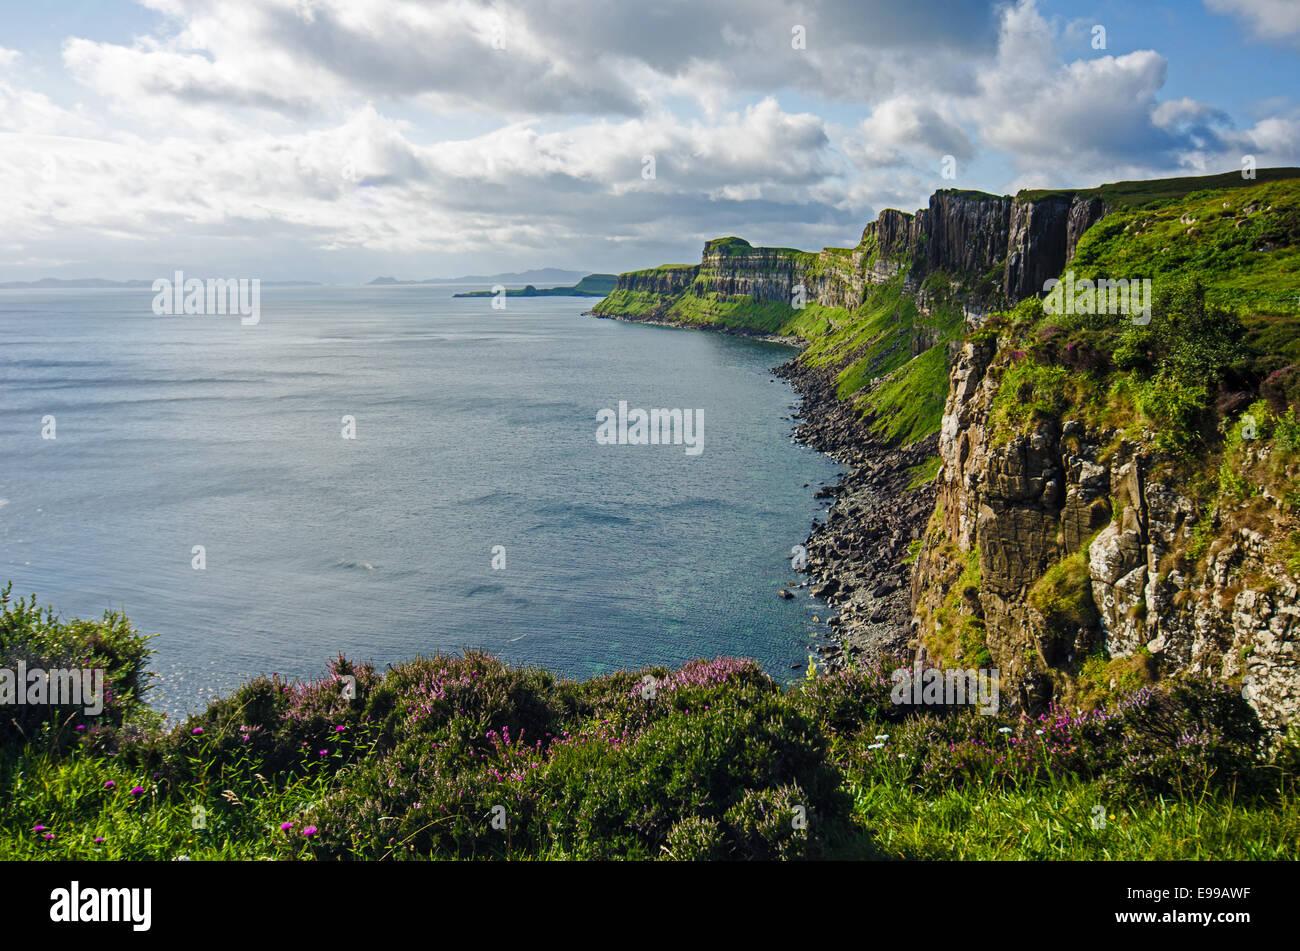 Klippen in der Nähe von Kilt Rock, Isle Of Skye, Jurassic coast Stockbild